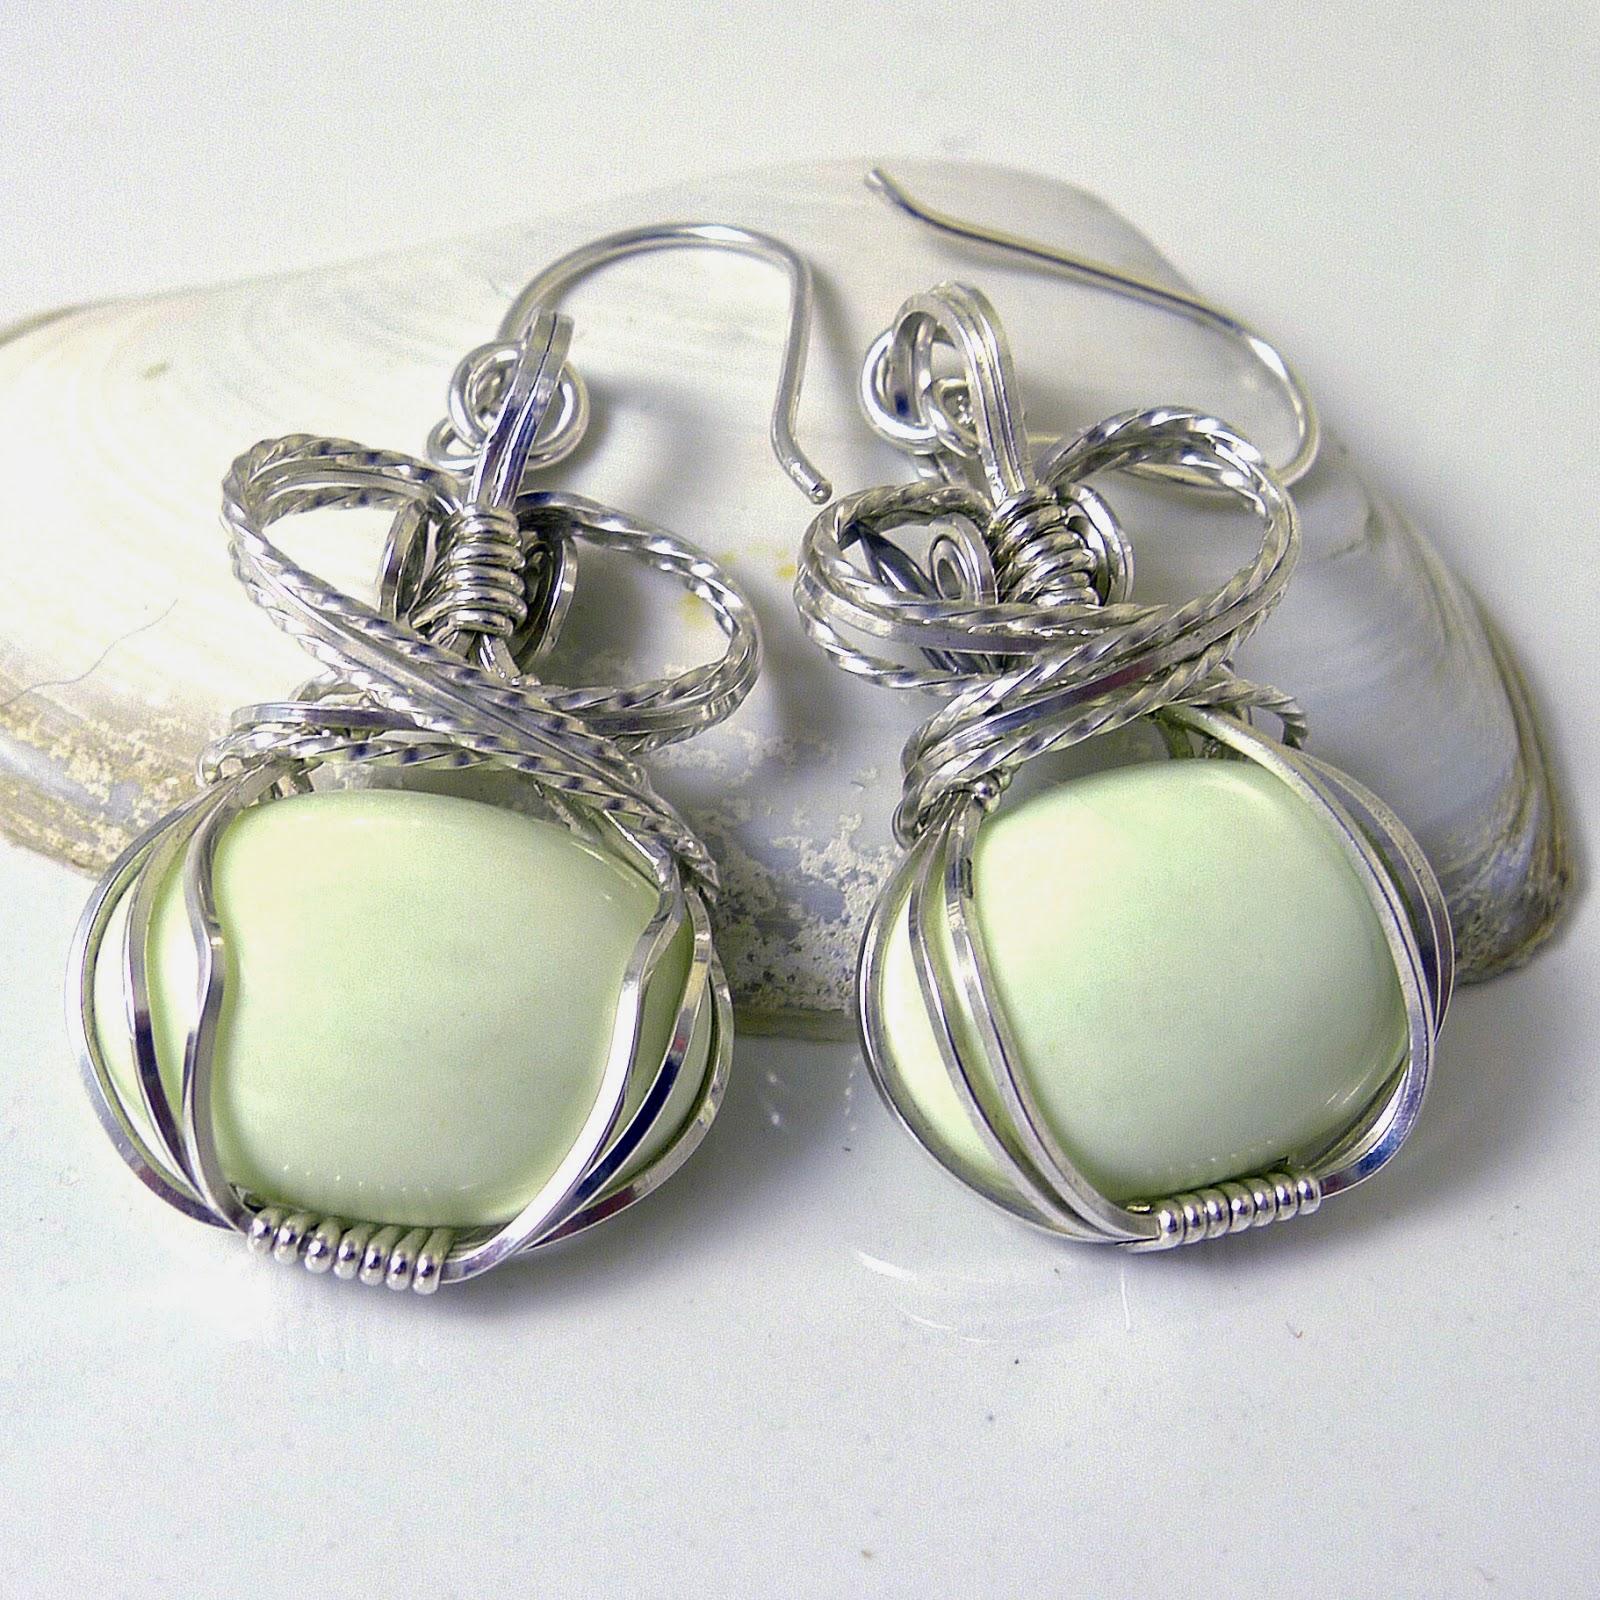 https://www.etsy.com/nz/listing/186583066/lemon-chrysoprase-and-sterling-silver